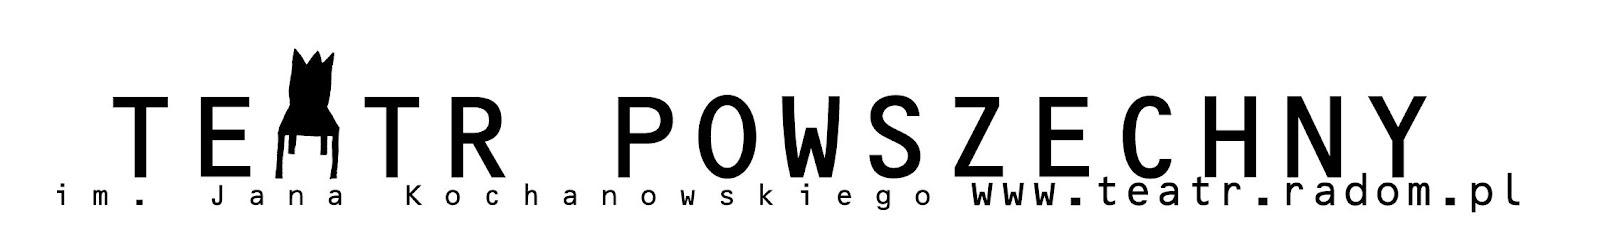 C:\Users\User\Desktop\logo.jpg